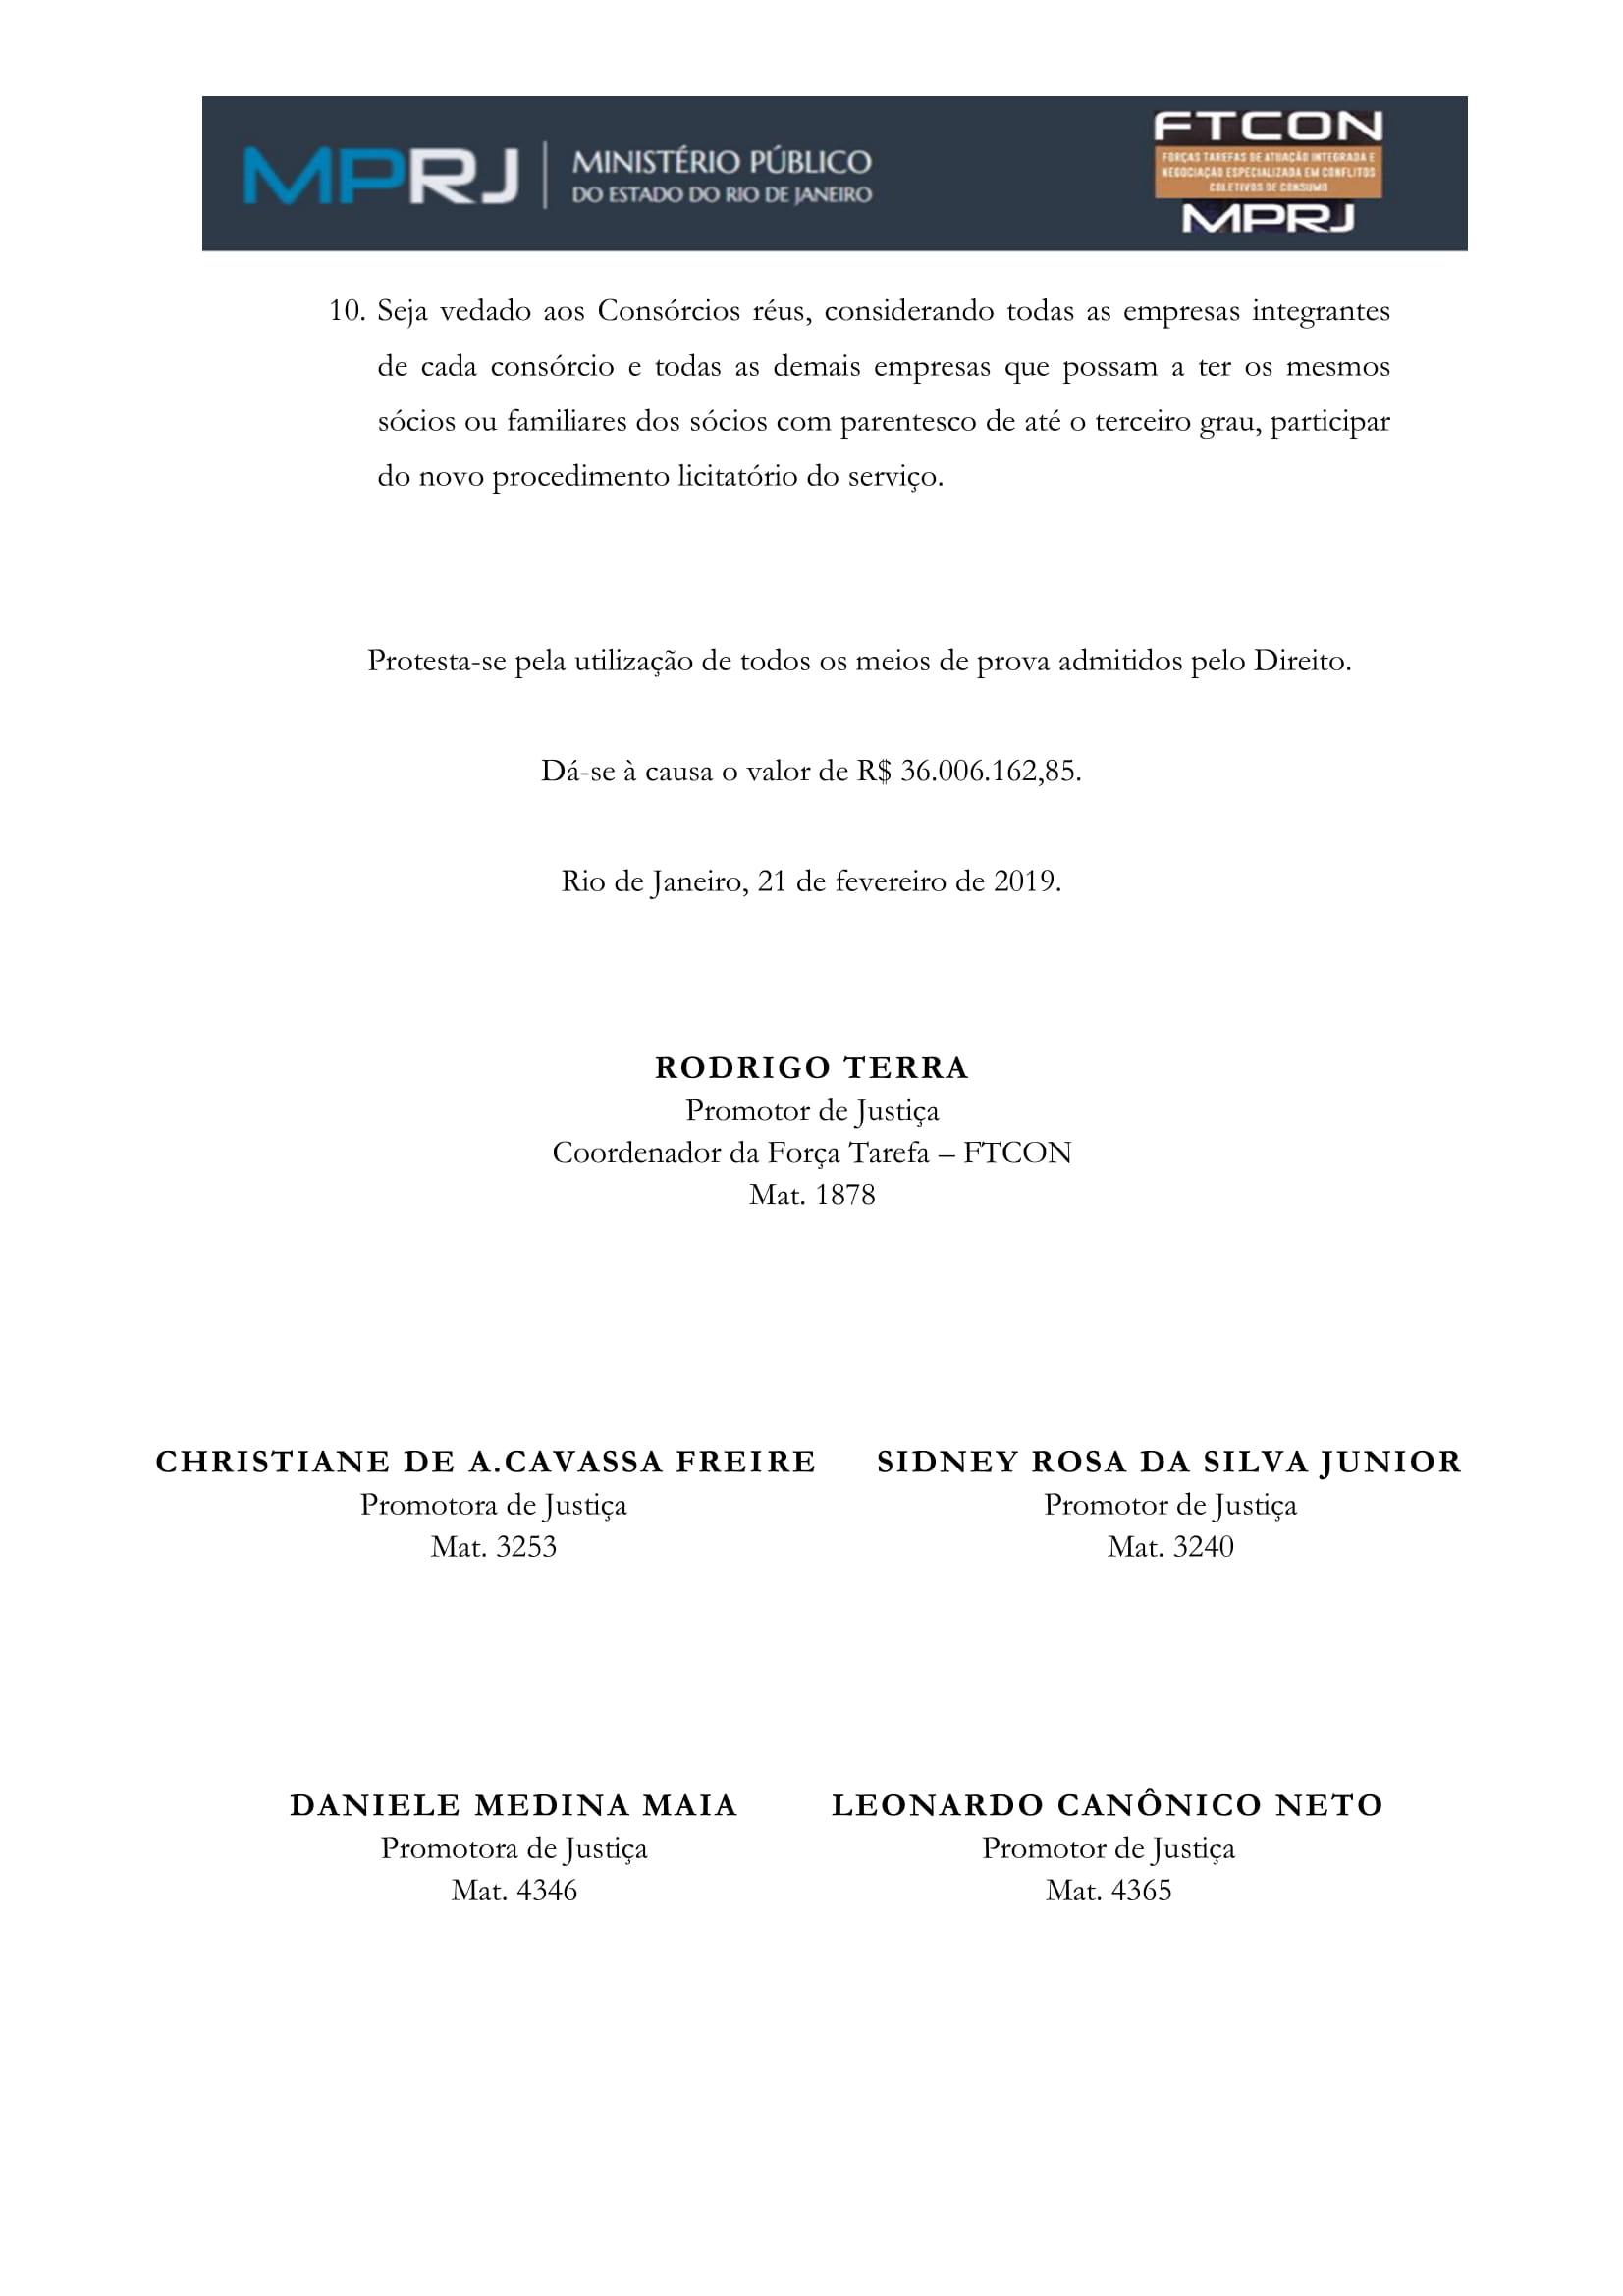 acp_caducidade_onibus_dr_rt-138